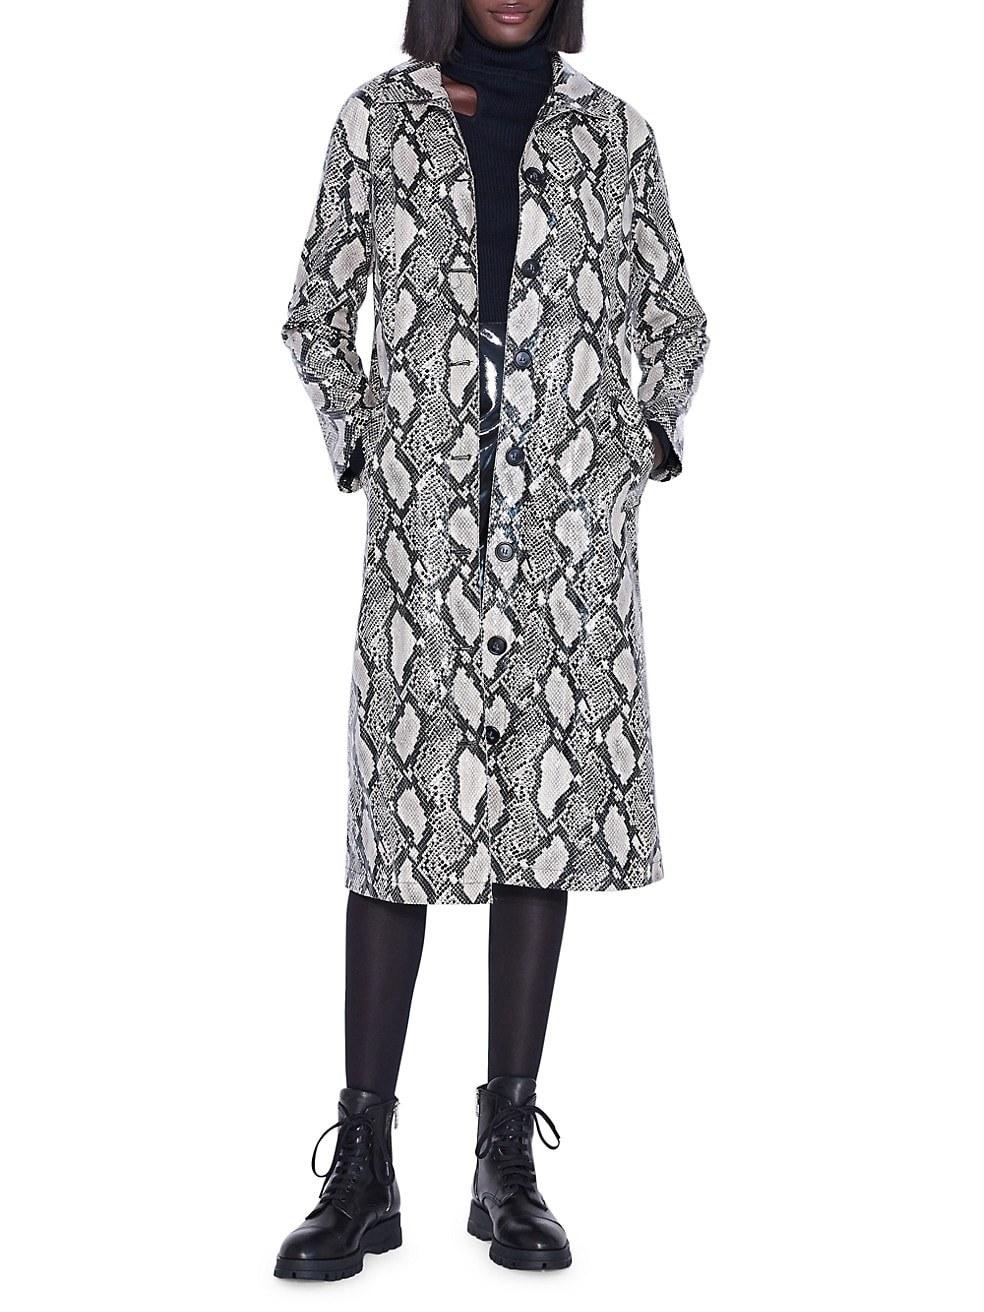 Model in the grey and white snake print knee-length coat